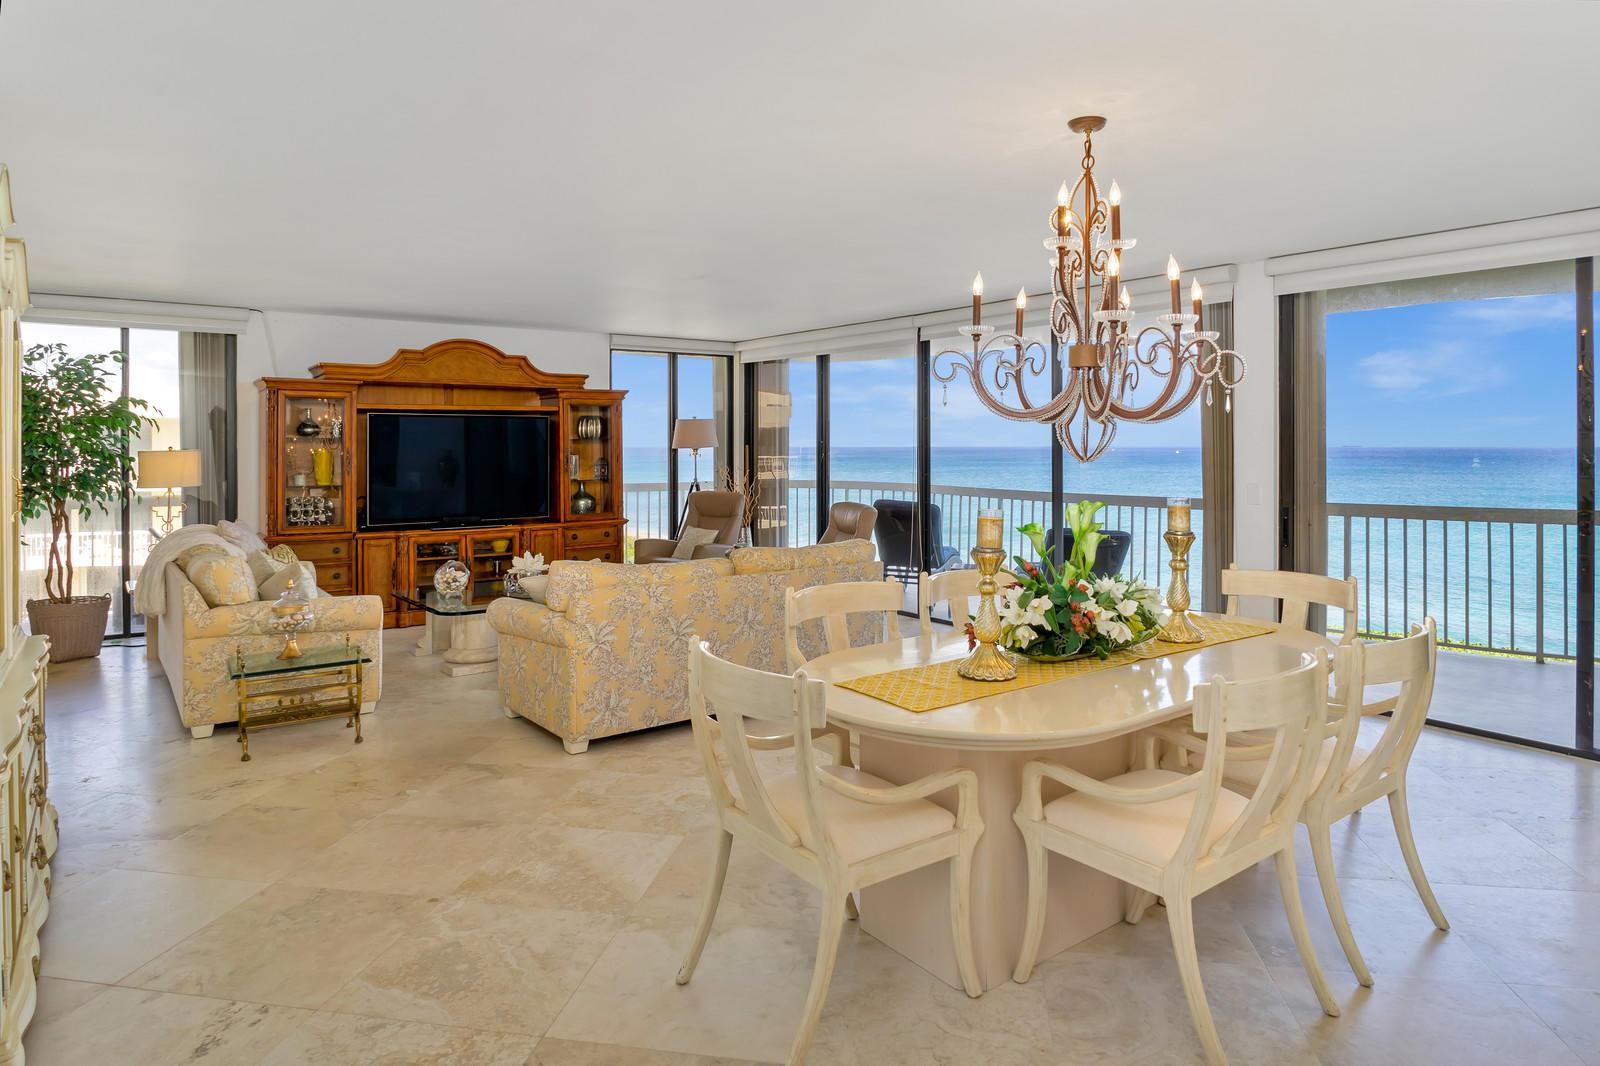 3300 Ocean Boulevard, Palm Beach, Florida 33480, 3 Bedrooms Bedrooms, ,2.1 BathroomsBathrooms,Condo/Coop,For Sale,Meridian,Ocean,5,RX-10484348